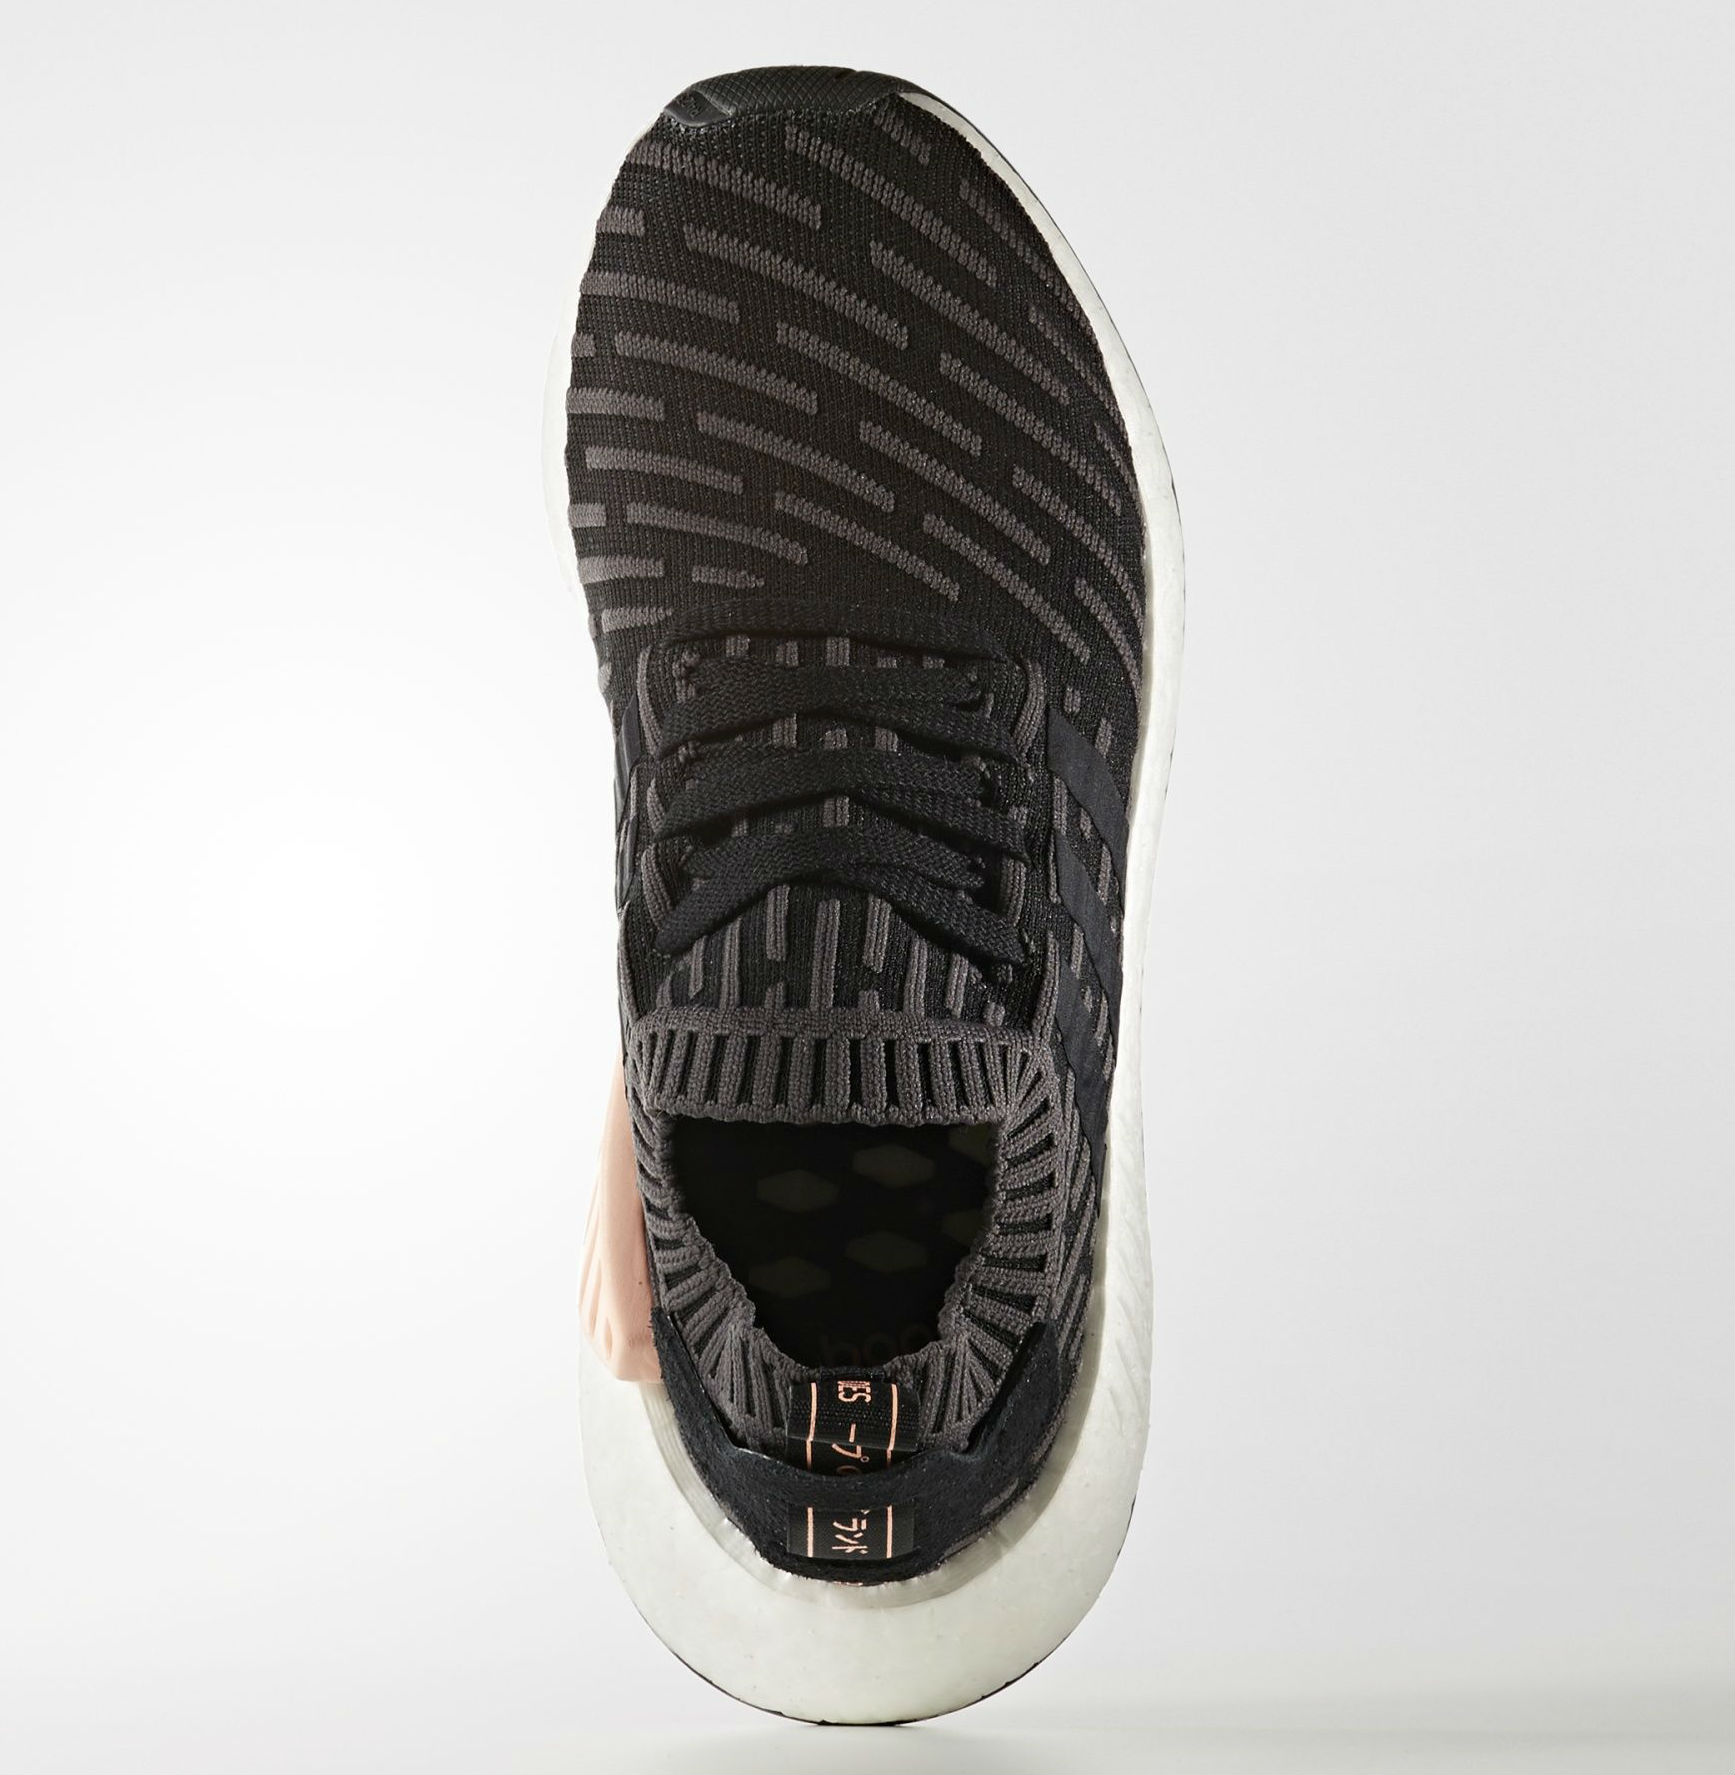 adidas NMD R2 Primeknit | Sole Collector